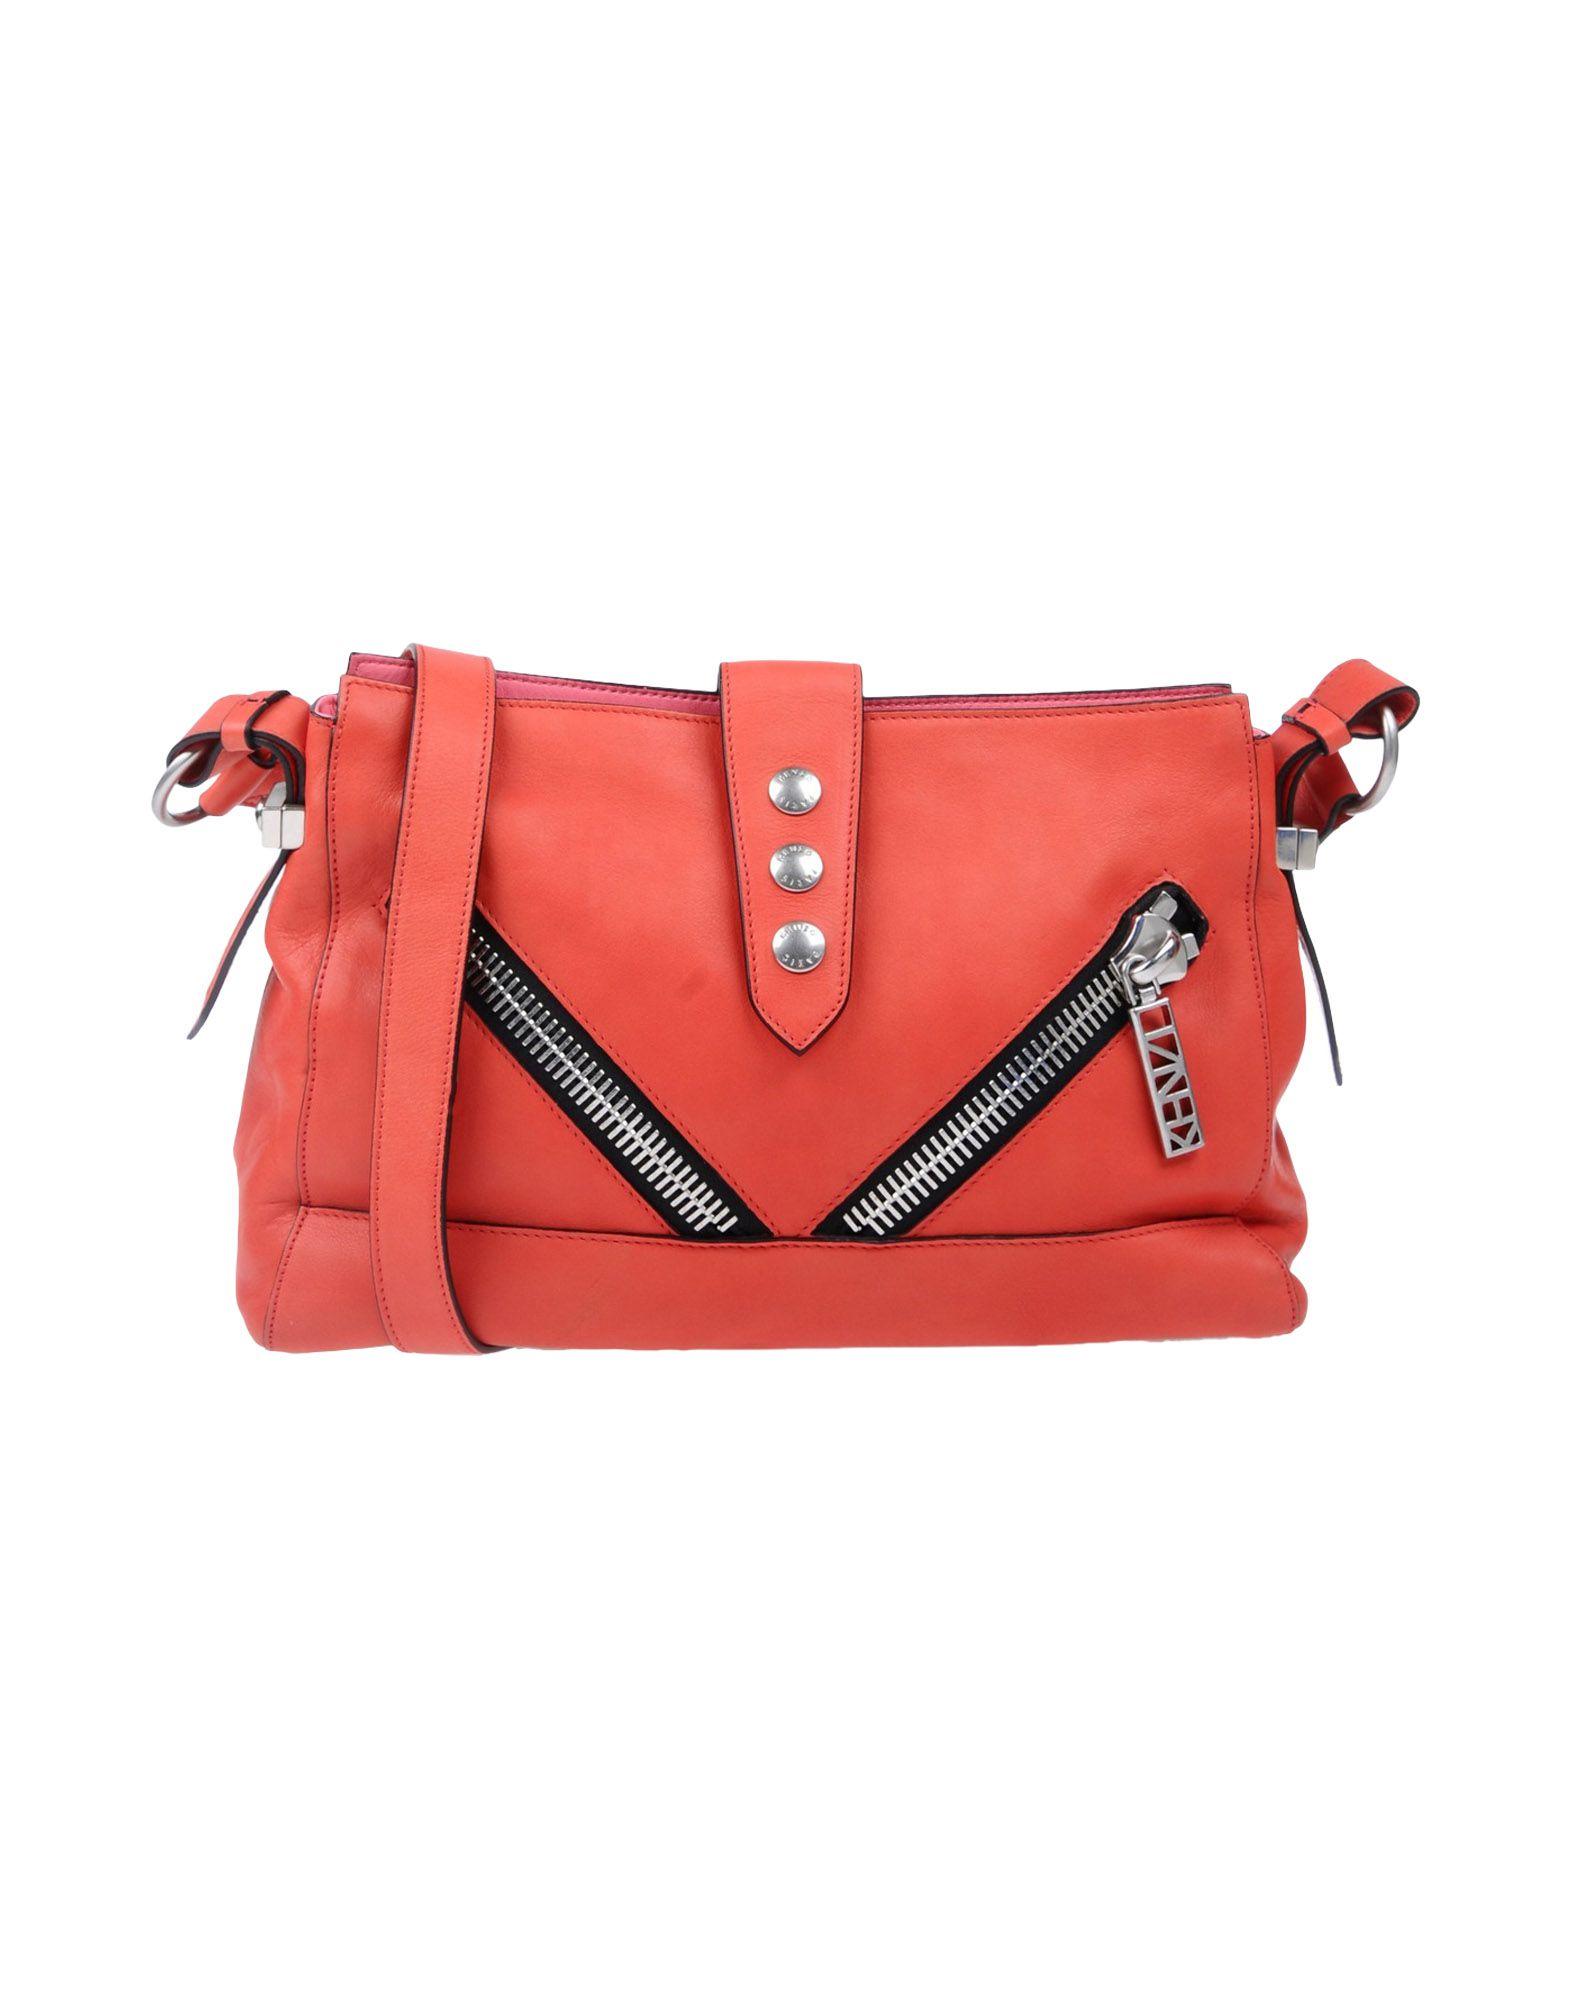 KENZO Сумка через плечо сумка kenzo f10902687 2015